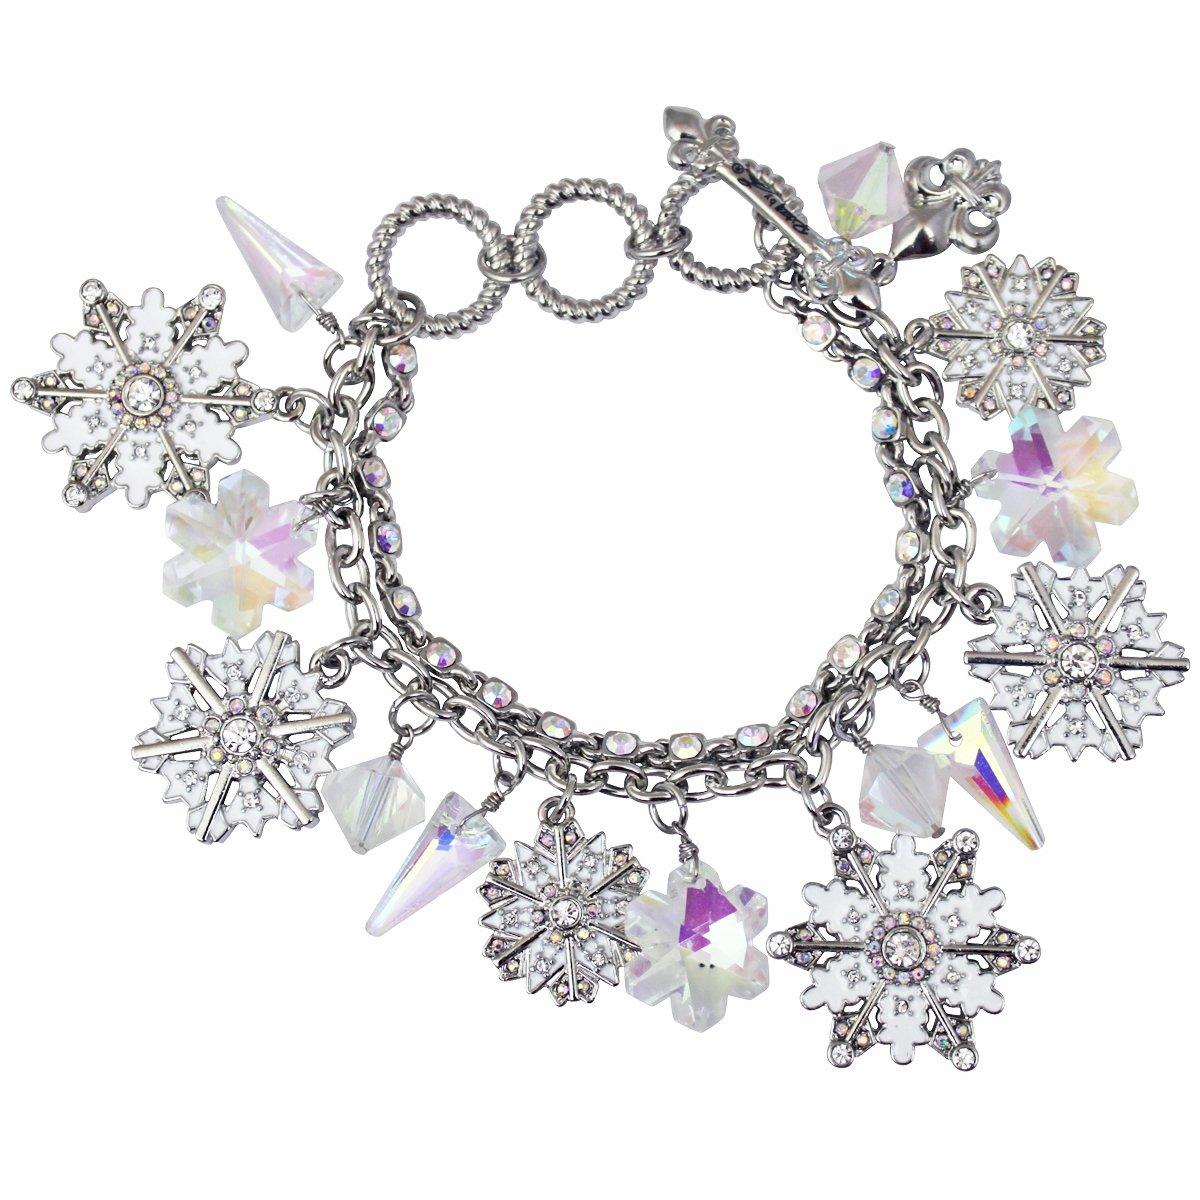 Ritzy Couture ''Blizzard'' Snowflake Two-Strand Charm Bracelet - Silvertone